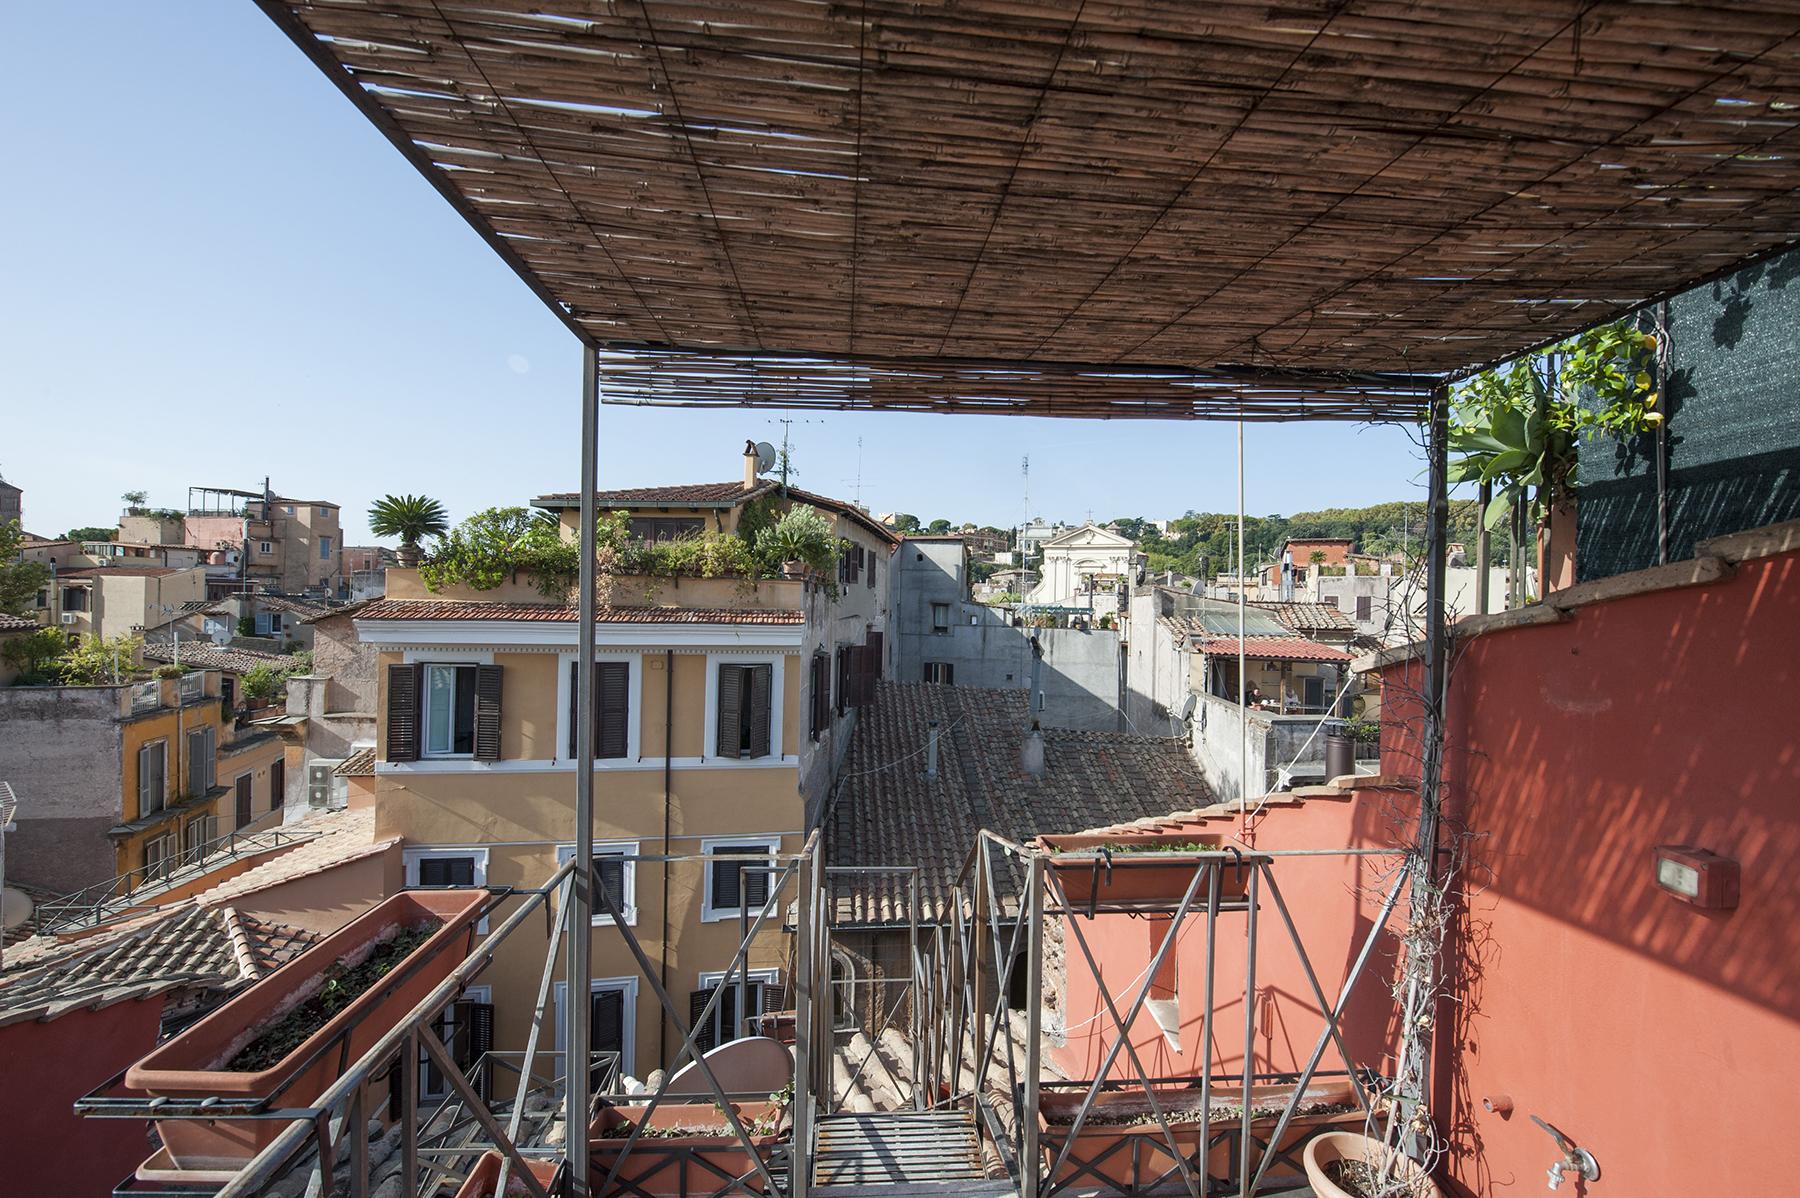 Apartamento por un Venta en Beautifully renovated penthouse in neighborhood Trastevere Rome, Roma Italia